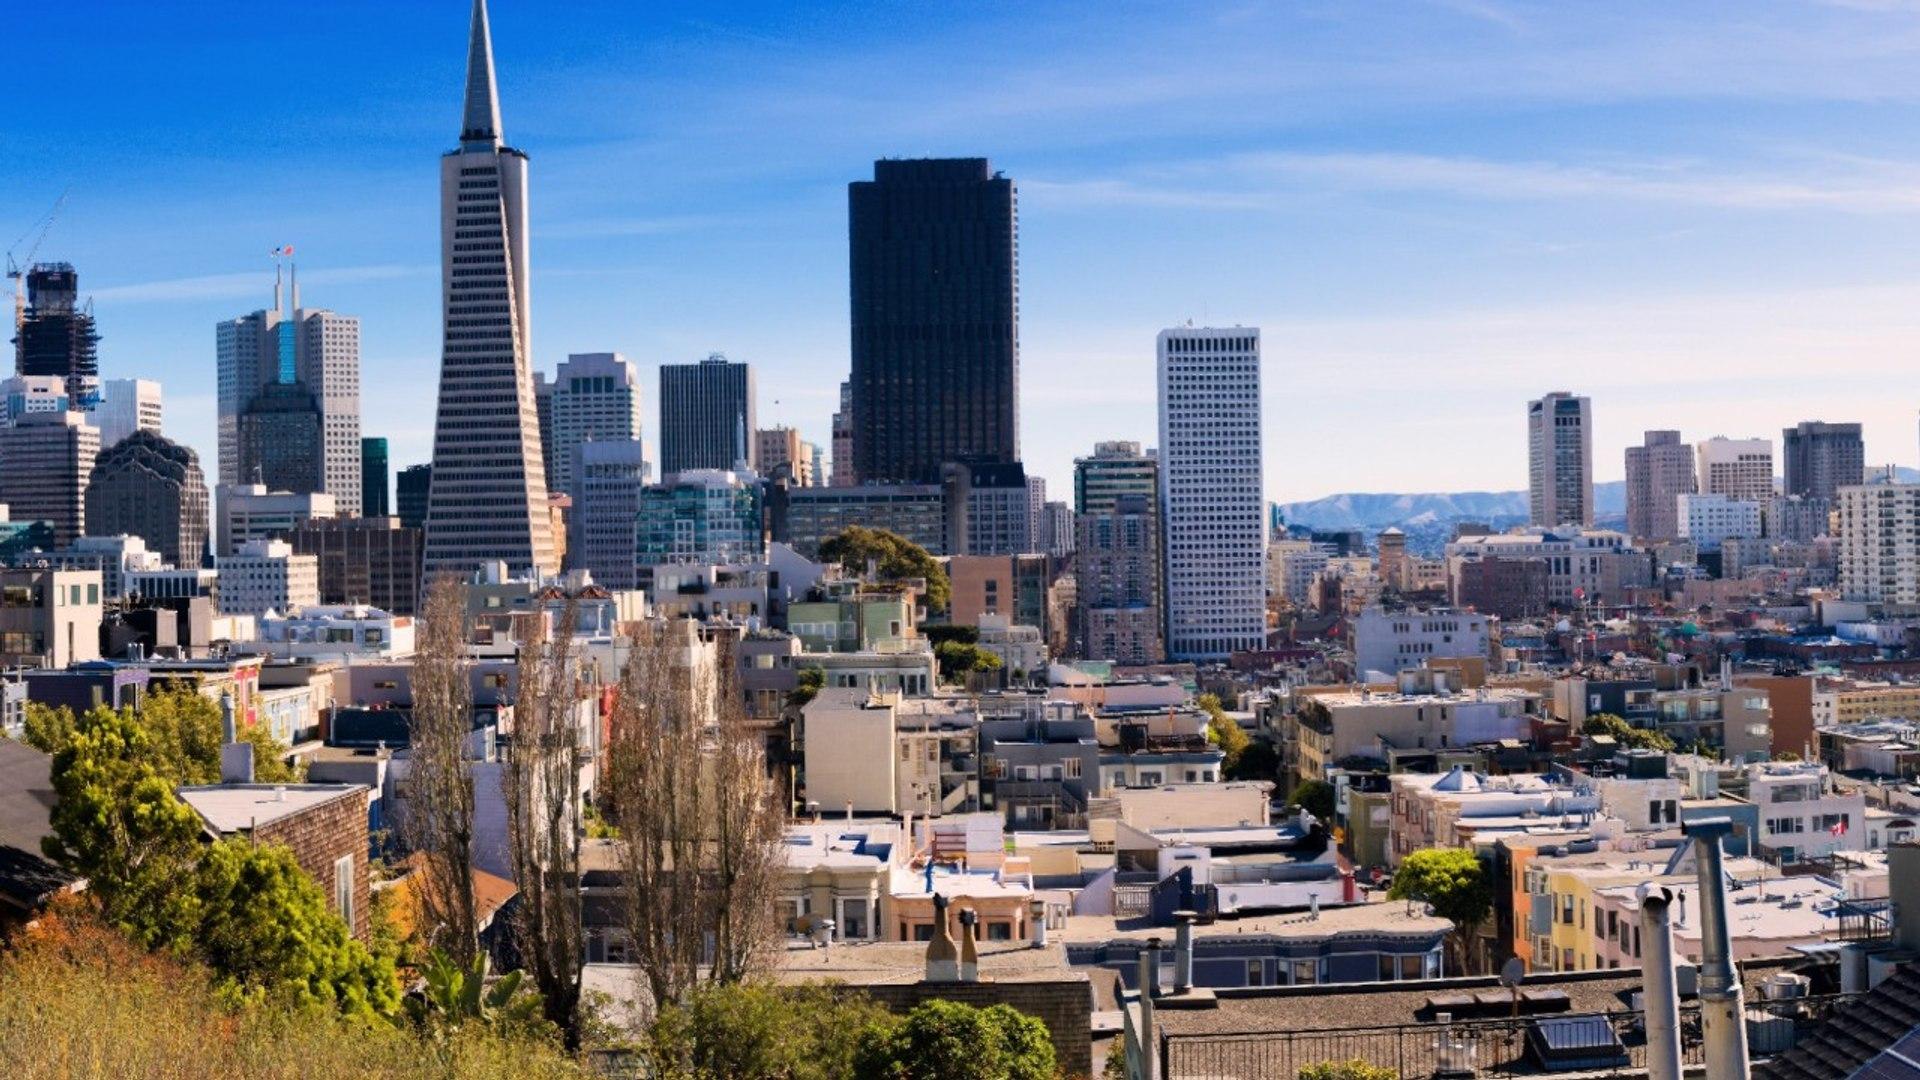 San Francisco has Huge Blackout